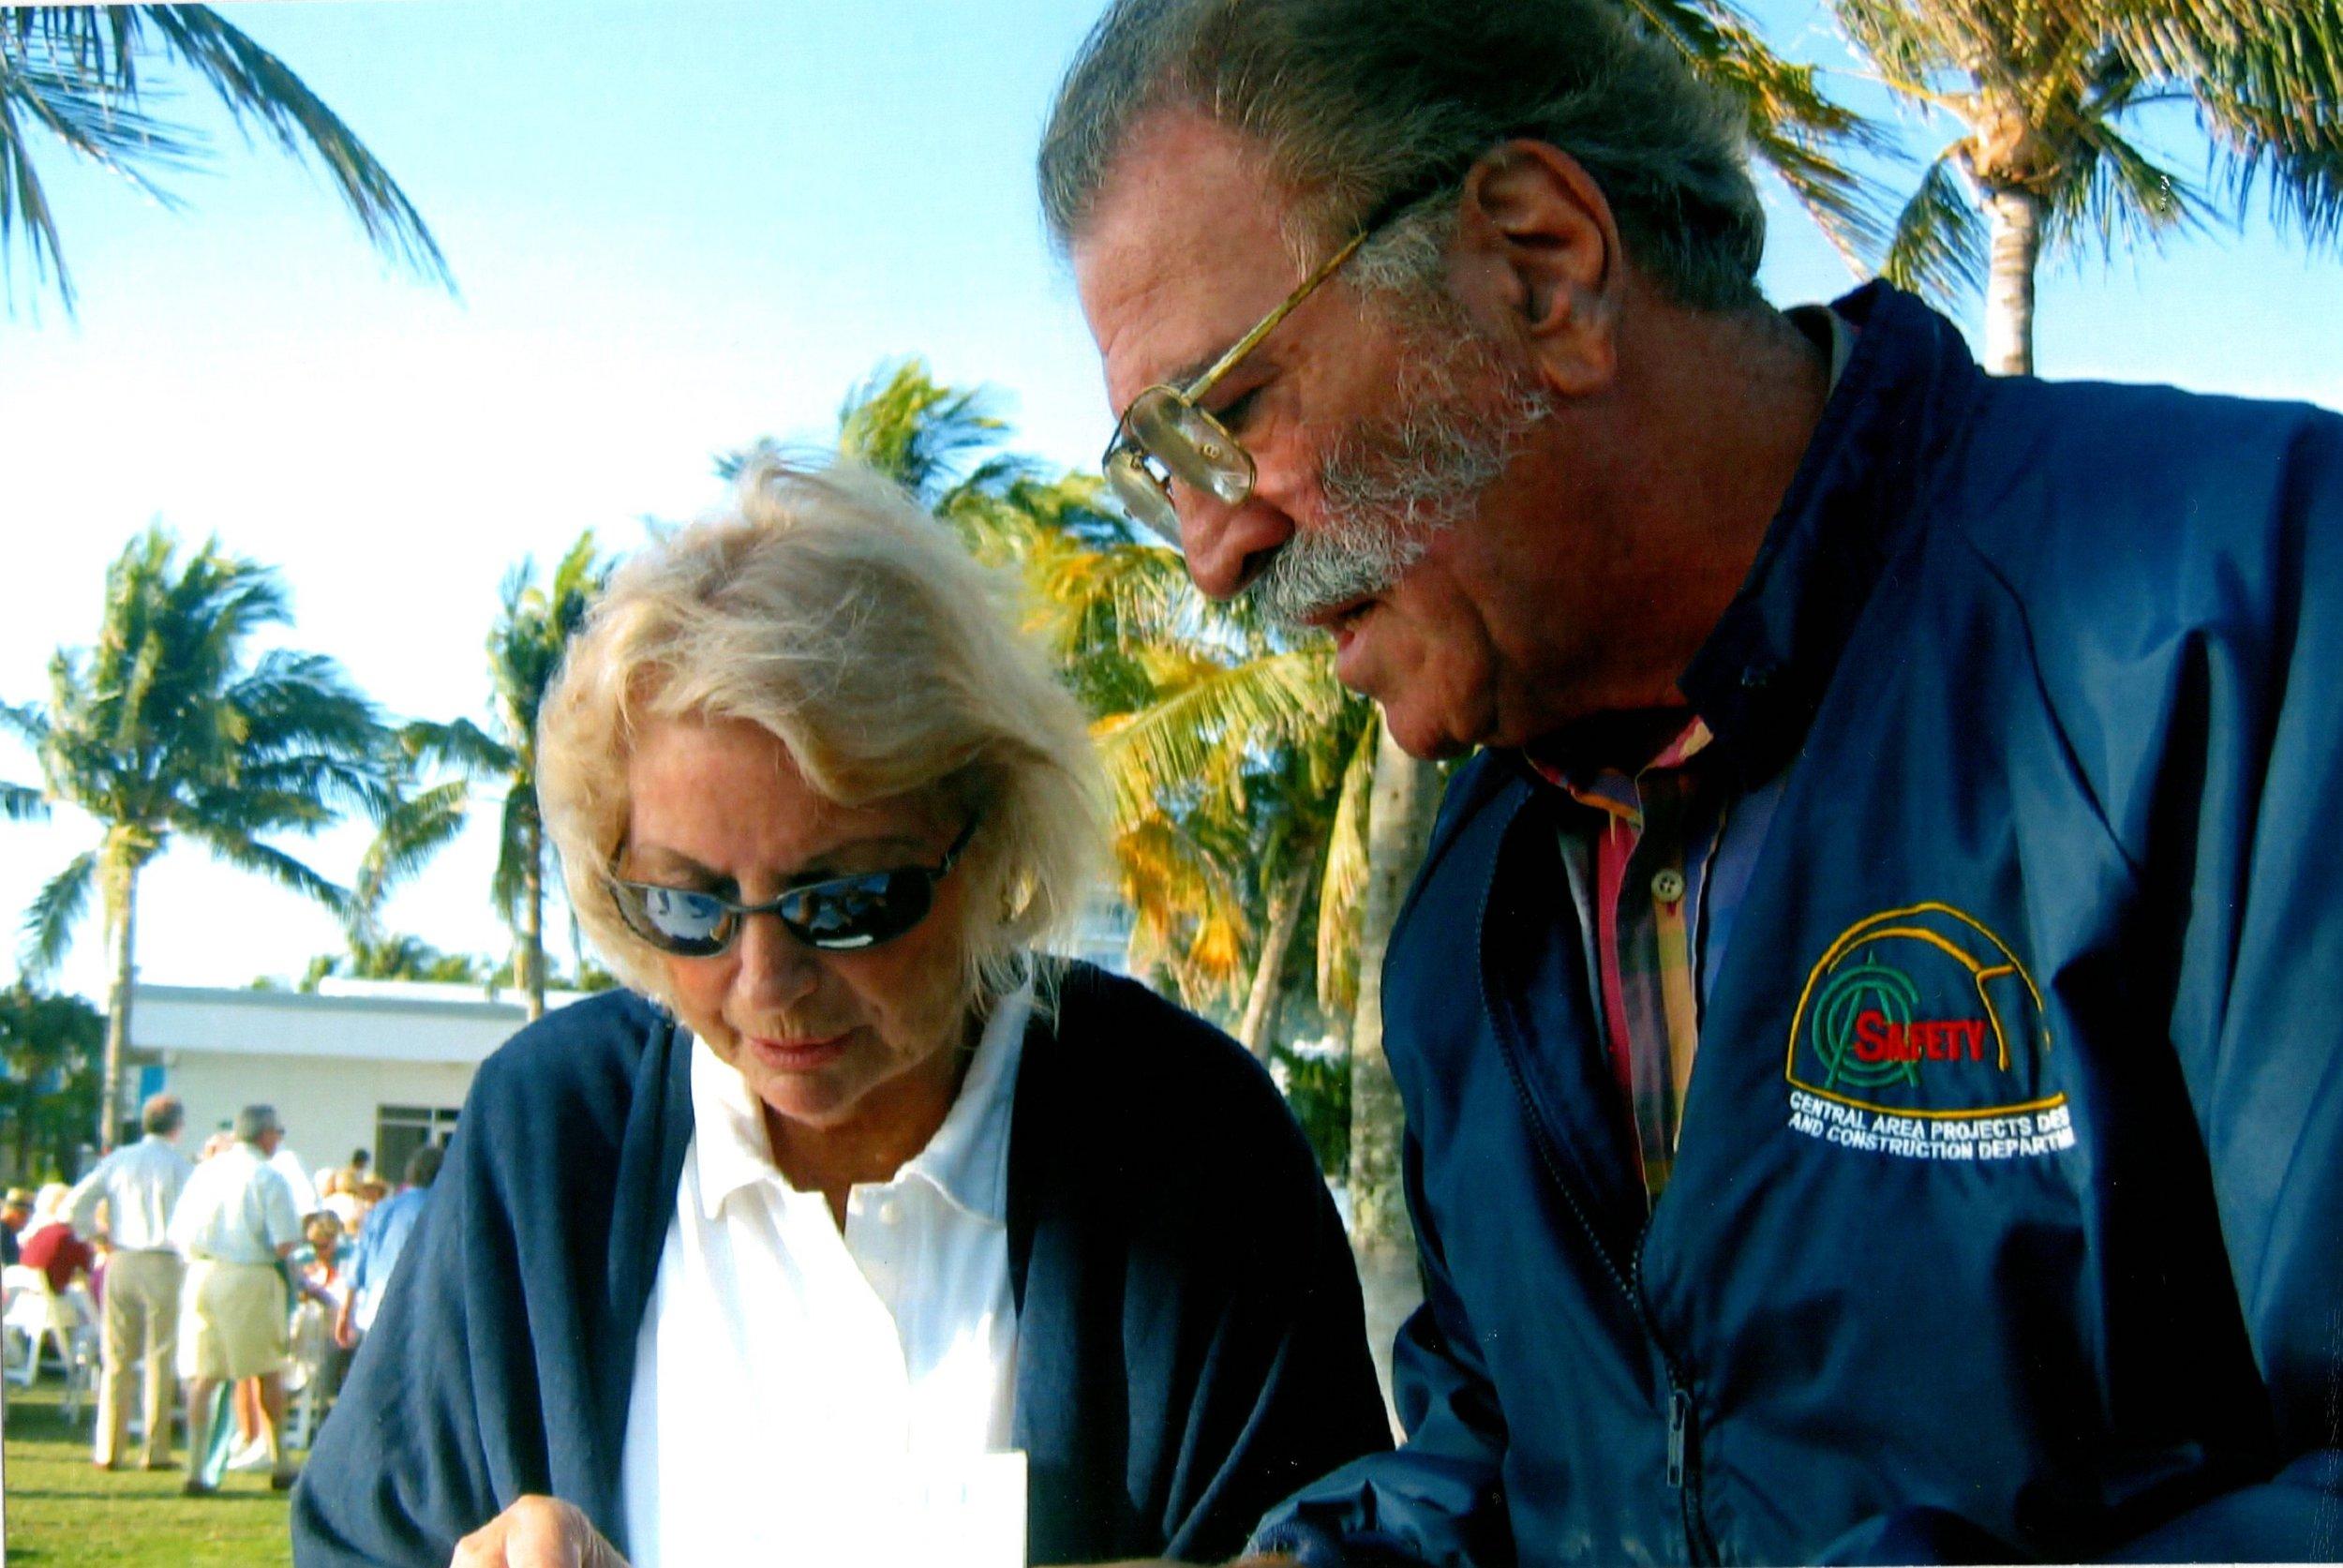 3_30_2008 - IVY LEAGUE PICNIC - NAPLES BEACH HOTEL 17.jpg